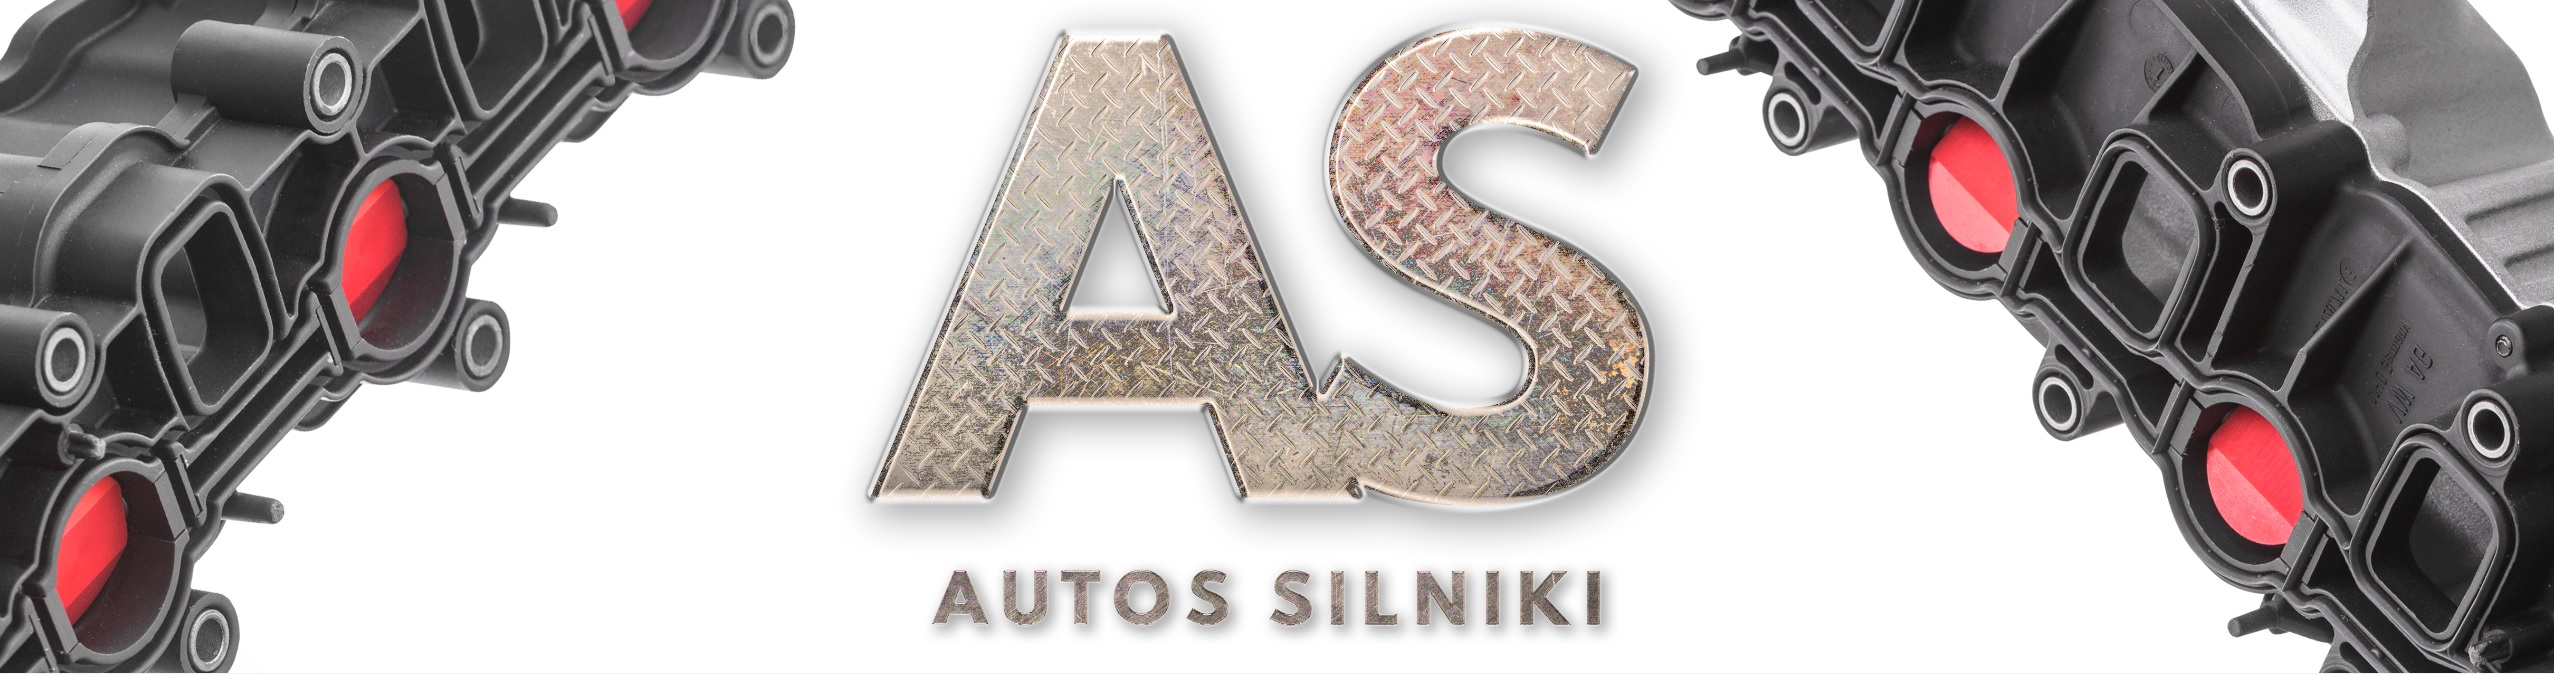 2 X KOLEKTOR + 2 X SILNIK AUDI VW 2.7 3.0 TDI